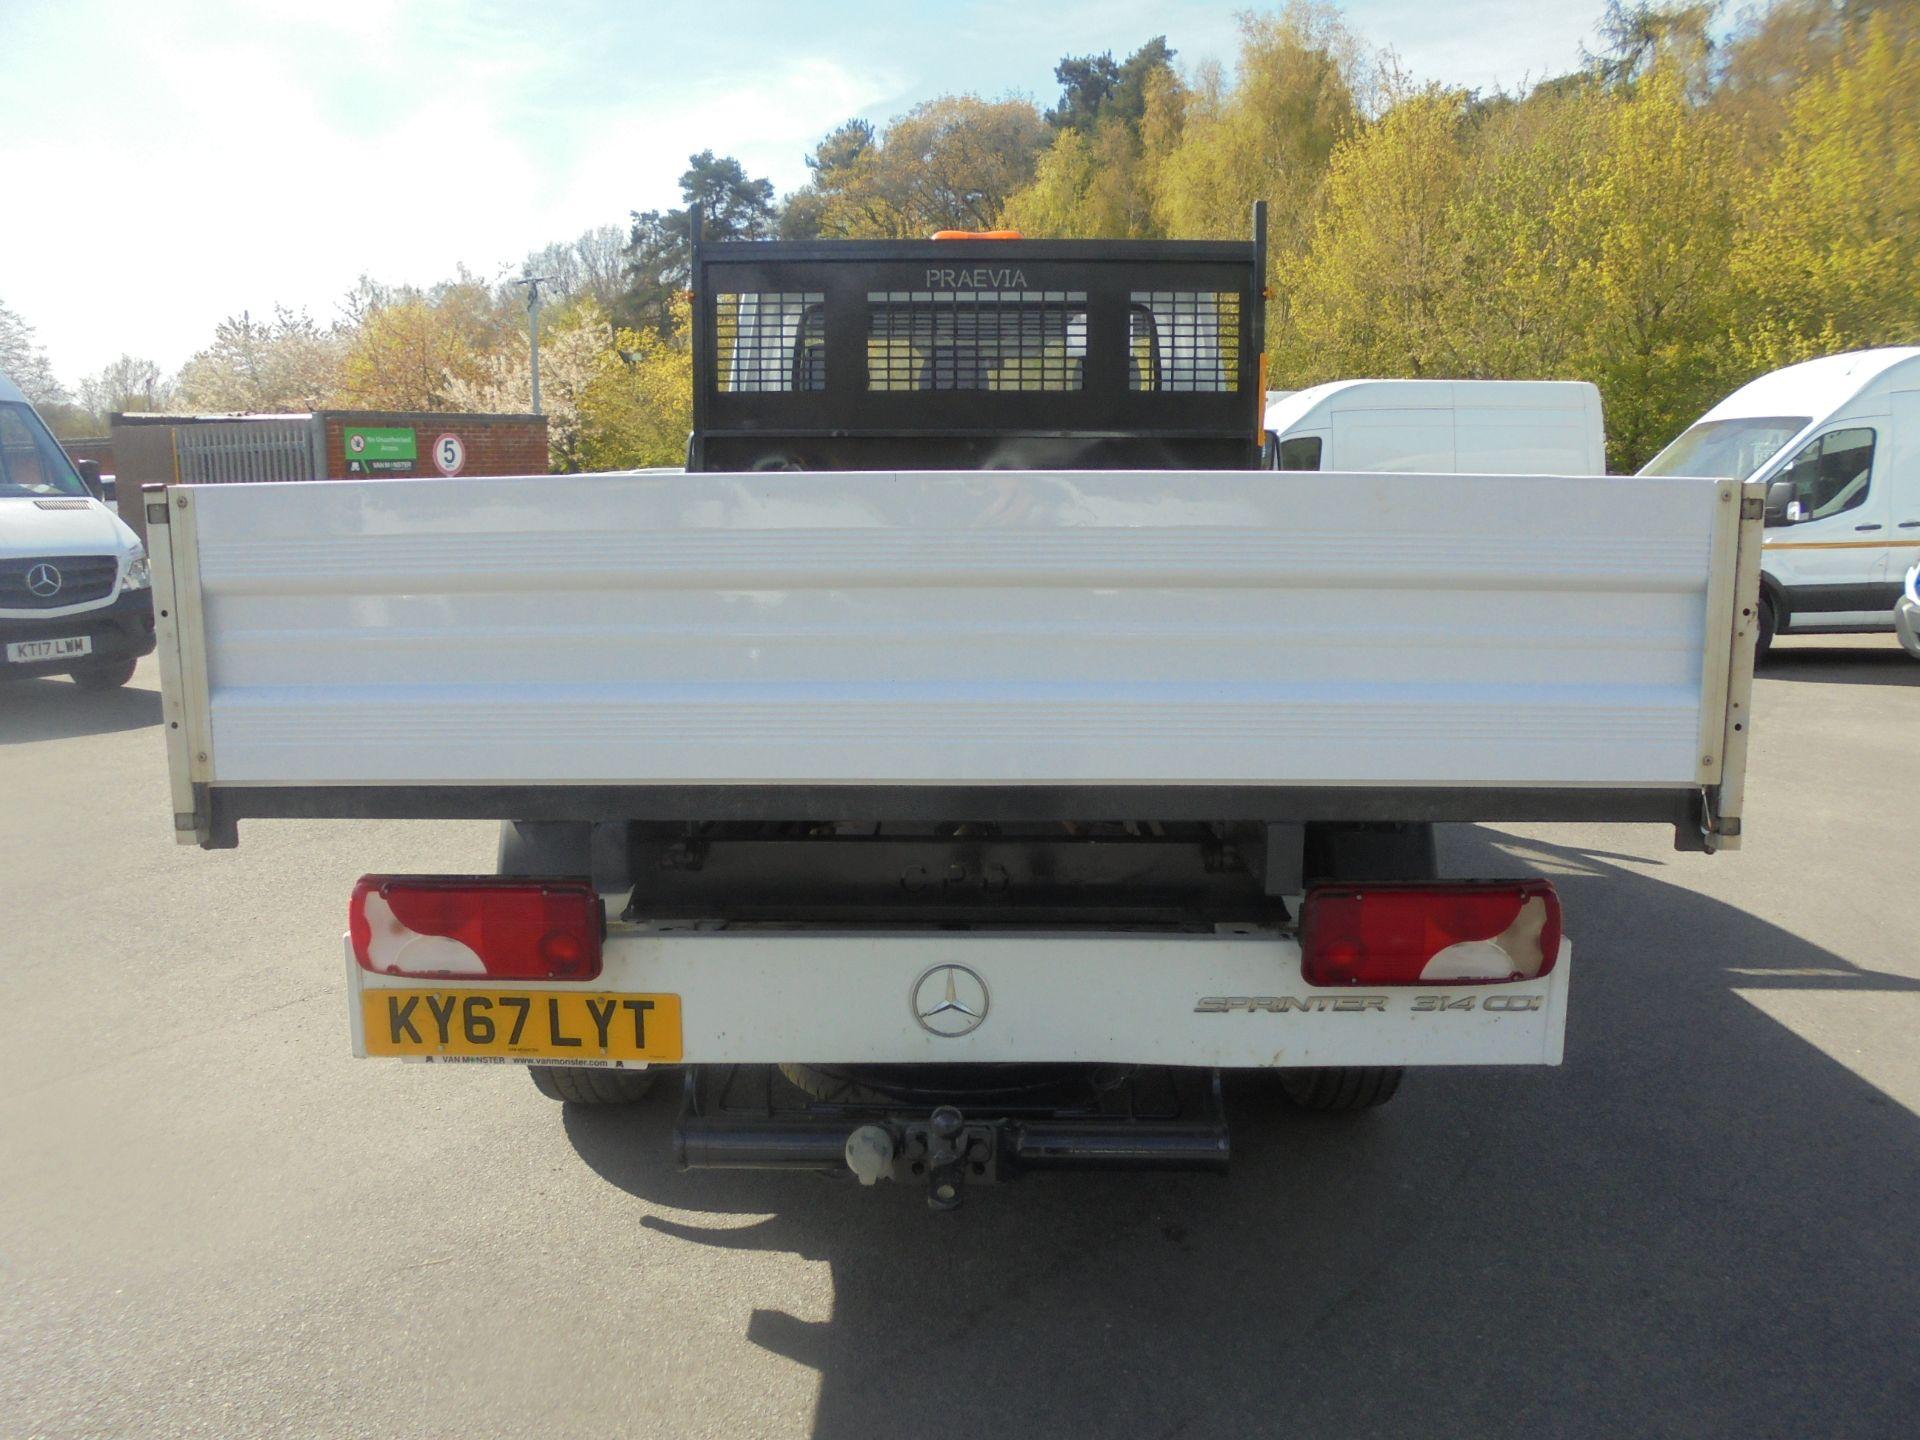 2018 Mercedes-Benz Sprinter 3.5T Single Cab Tipper (KY67LYT) Image 7